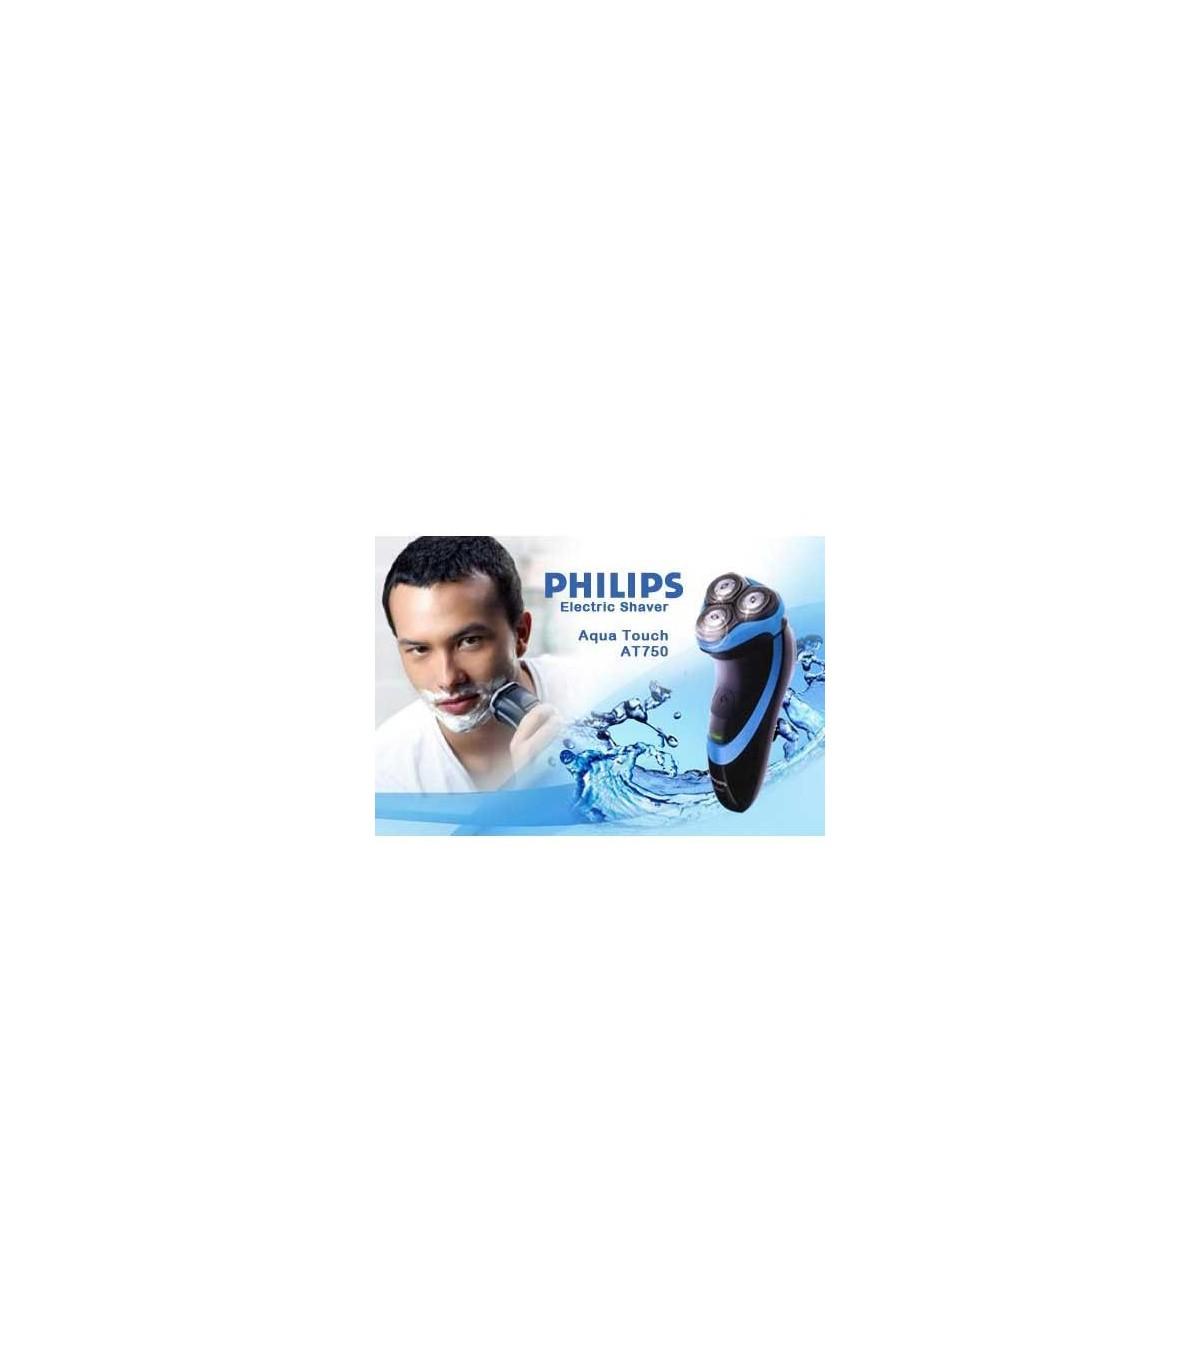 ماشین اصلاح صورت فیلیپس AT750/20